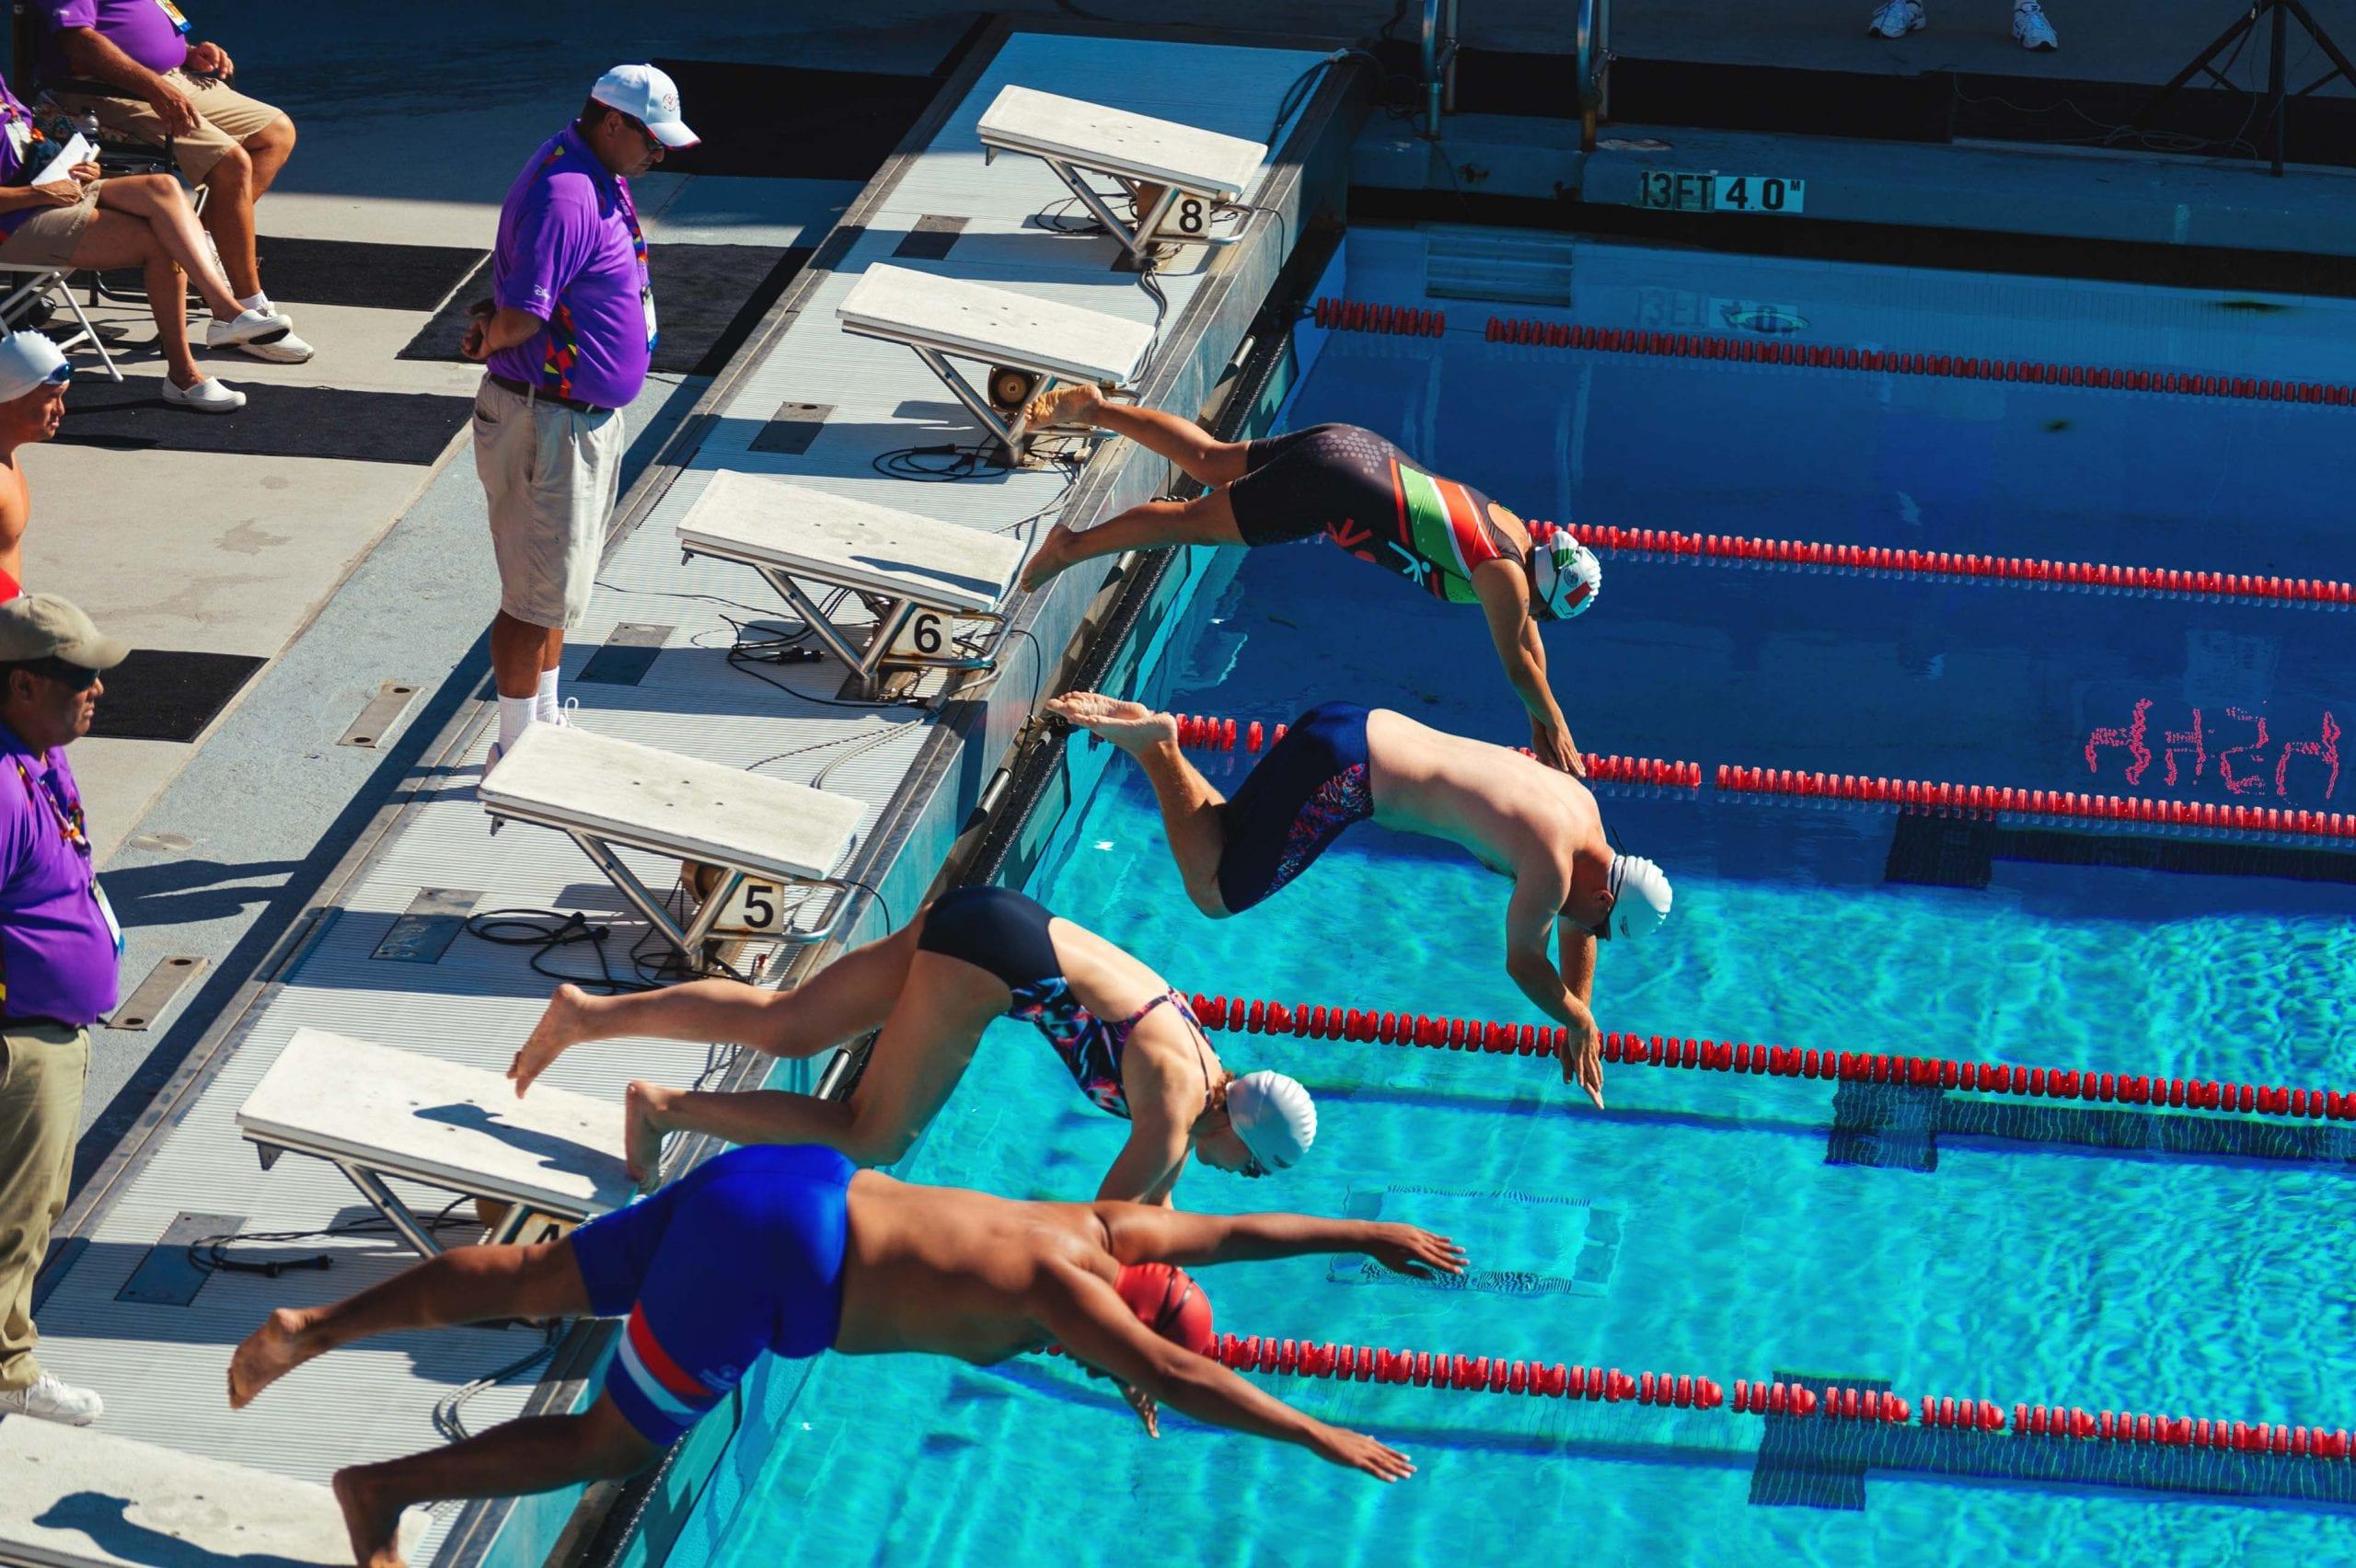 SwimmingSpecO28July2015 (38 of 223)-Edit